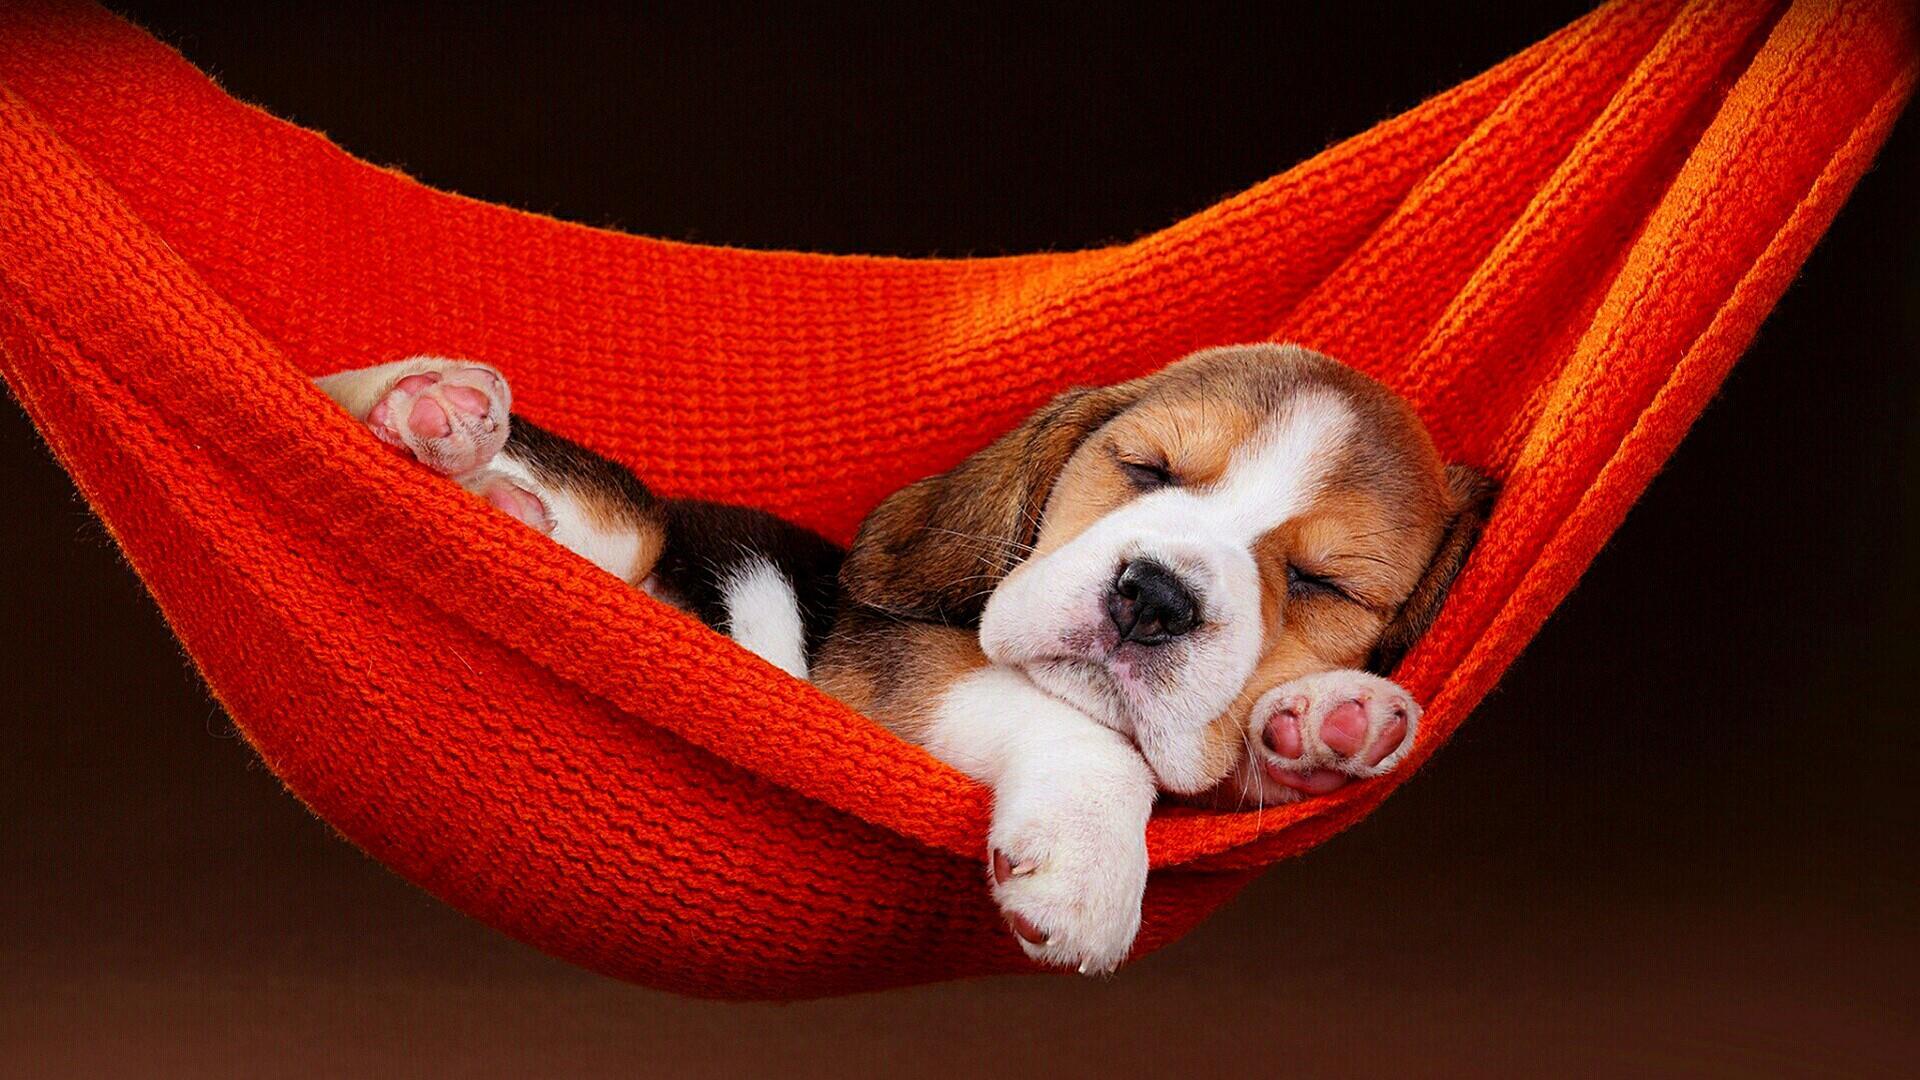 Dog Puppy Sleeping Hammock 1920x1080